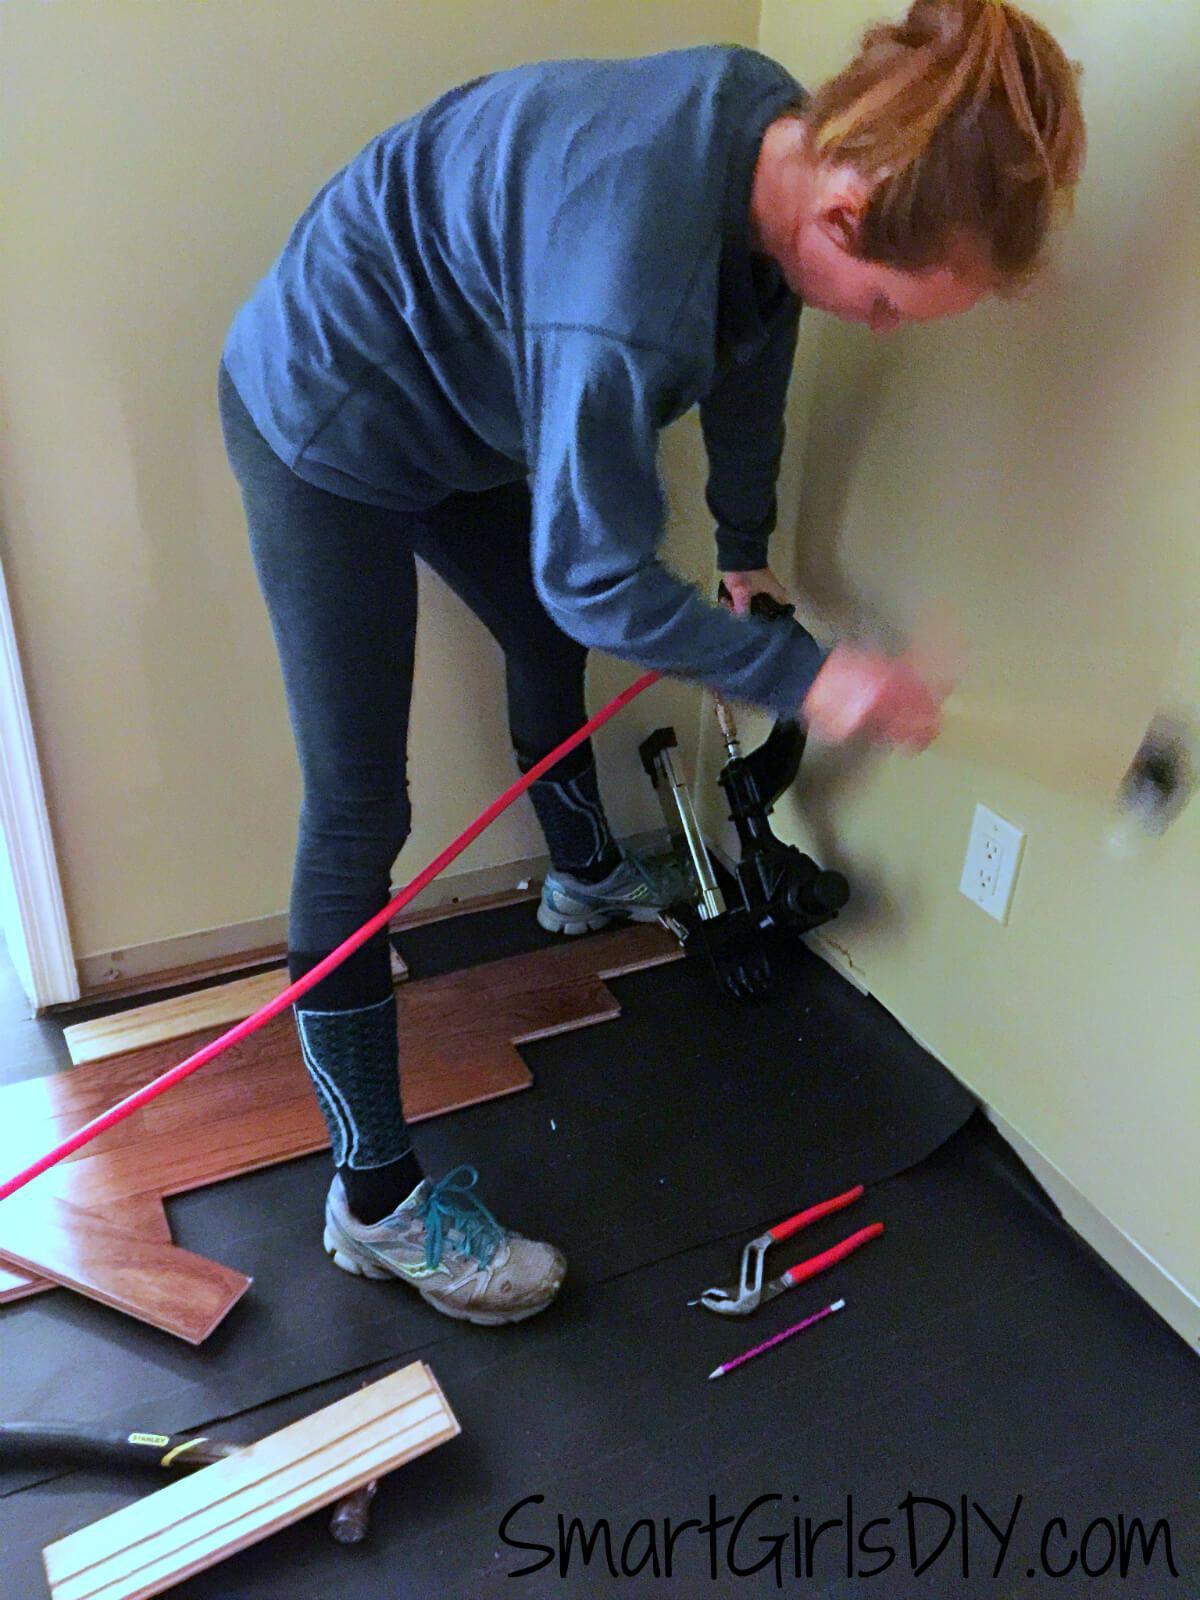 how to install 3 4 hardwood flooring on concrete of upstairs hallway 1 installing hardwood floors regarding installing bruce hardwood floor diy